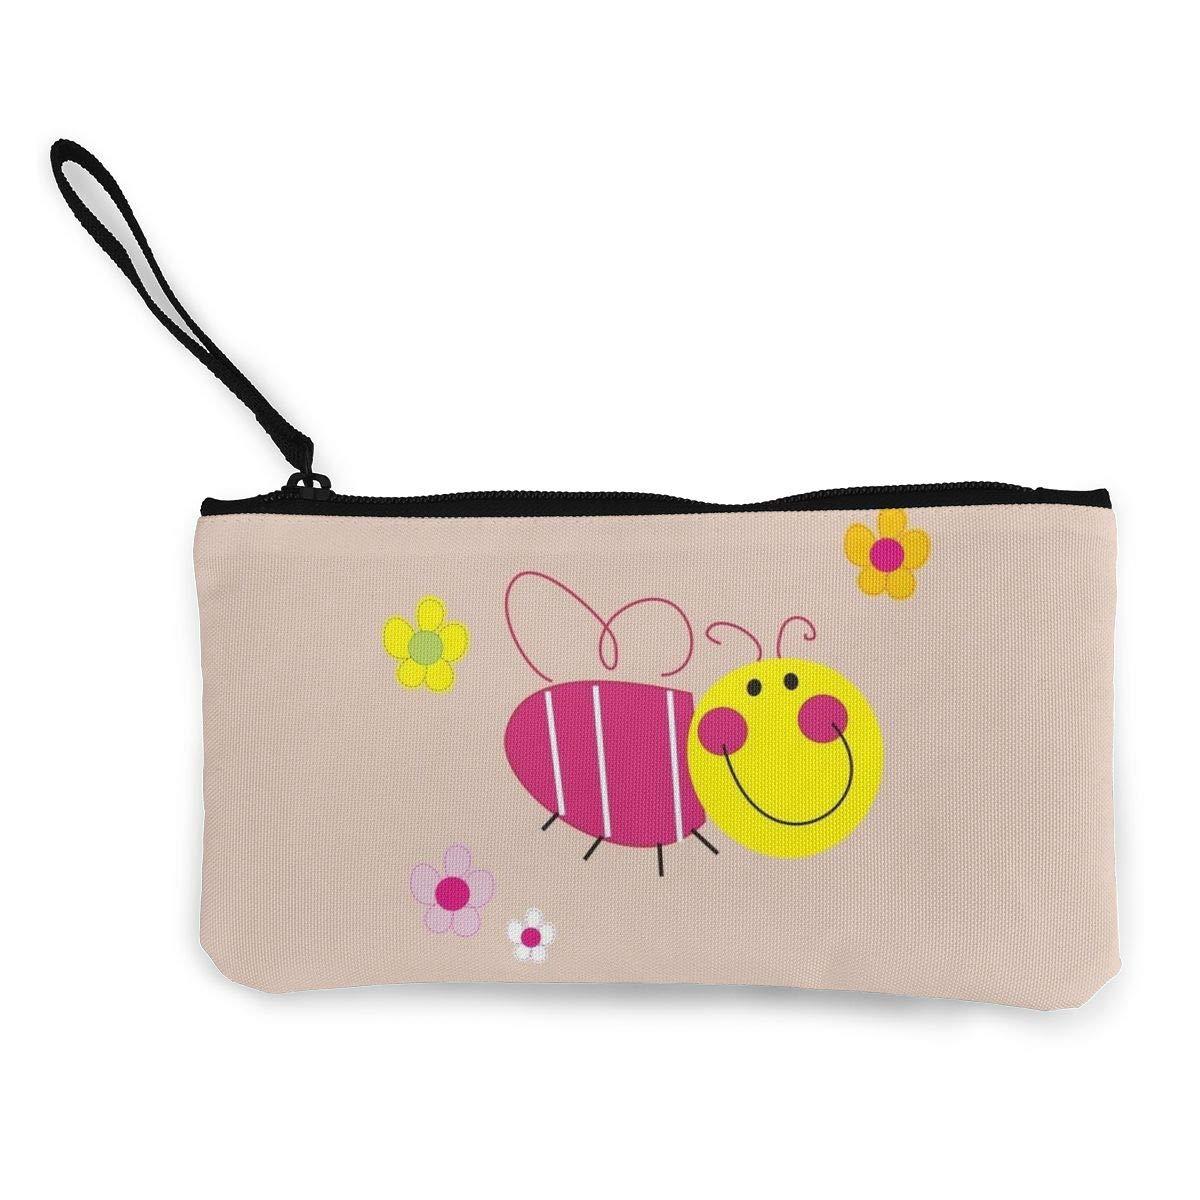 Little Bee Zipper Canvas Coin Purse Wallet Cellphone Bag With Handle Make Up Bag